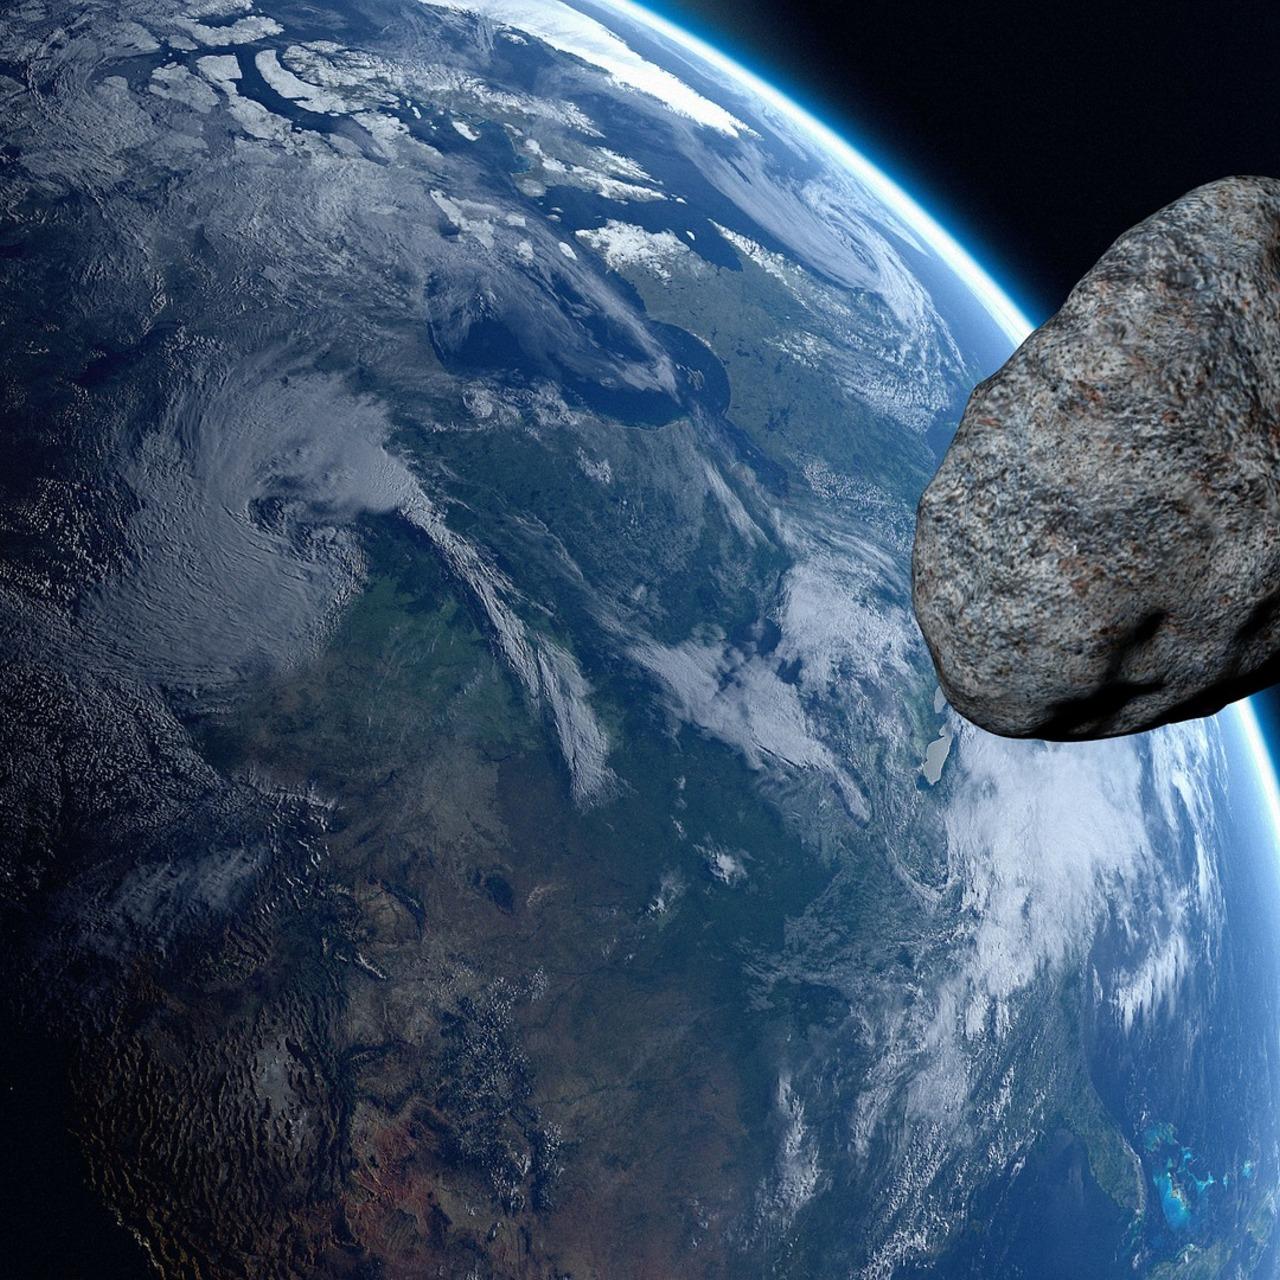 фото метеоритов упавших на землю